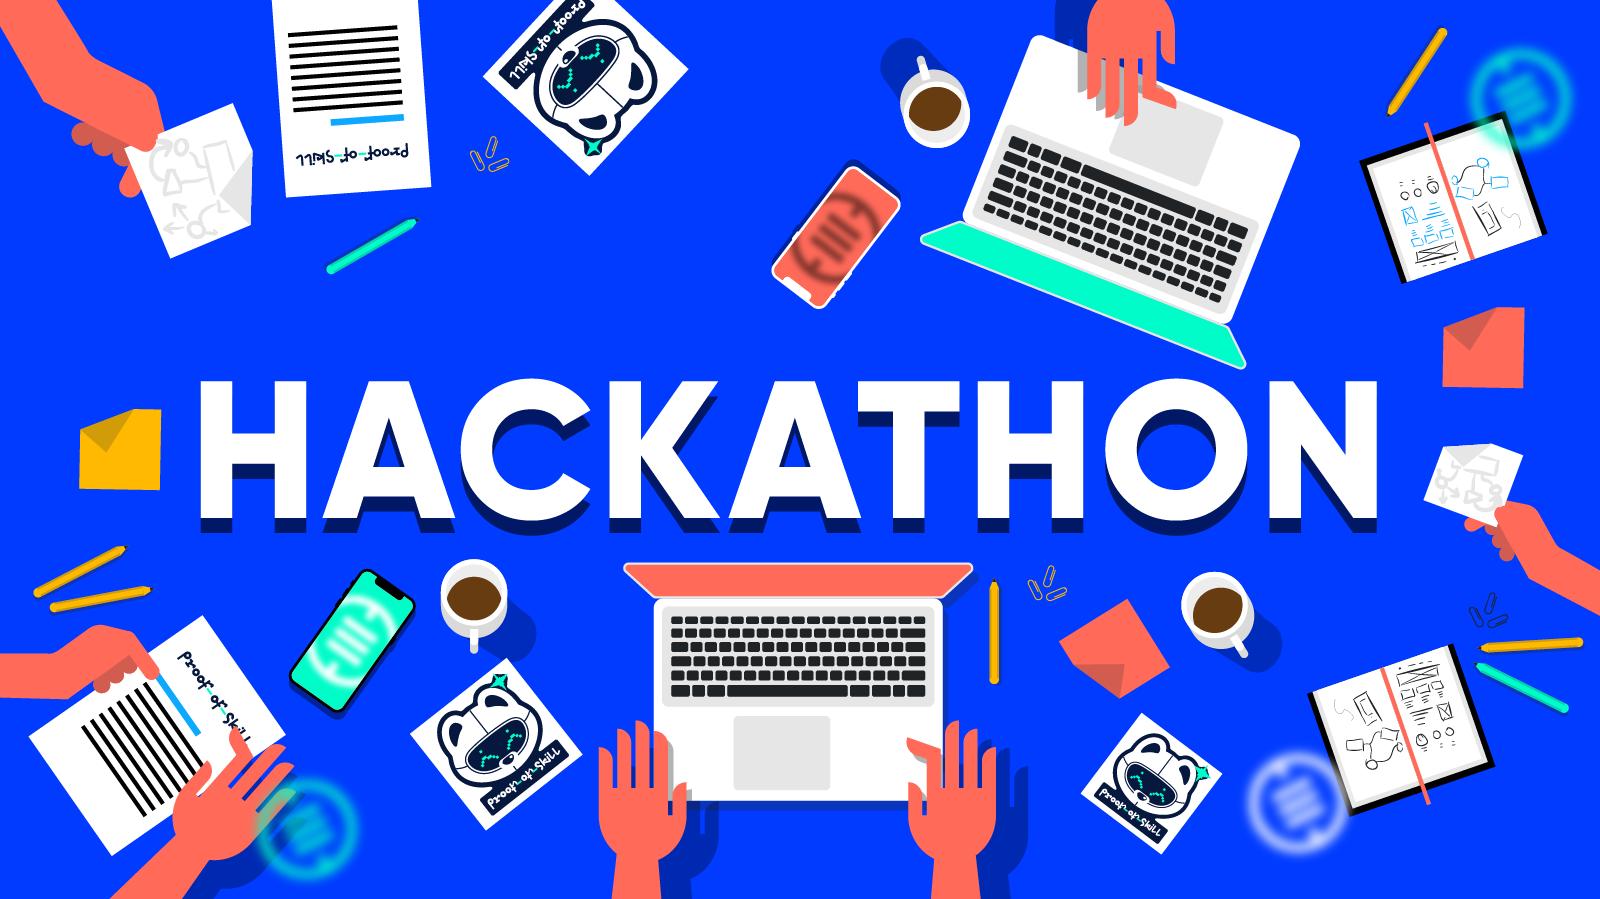 /my-hackathon-experiences-73b0b6191409 feature image